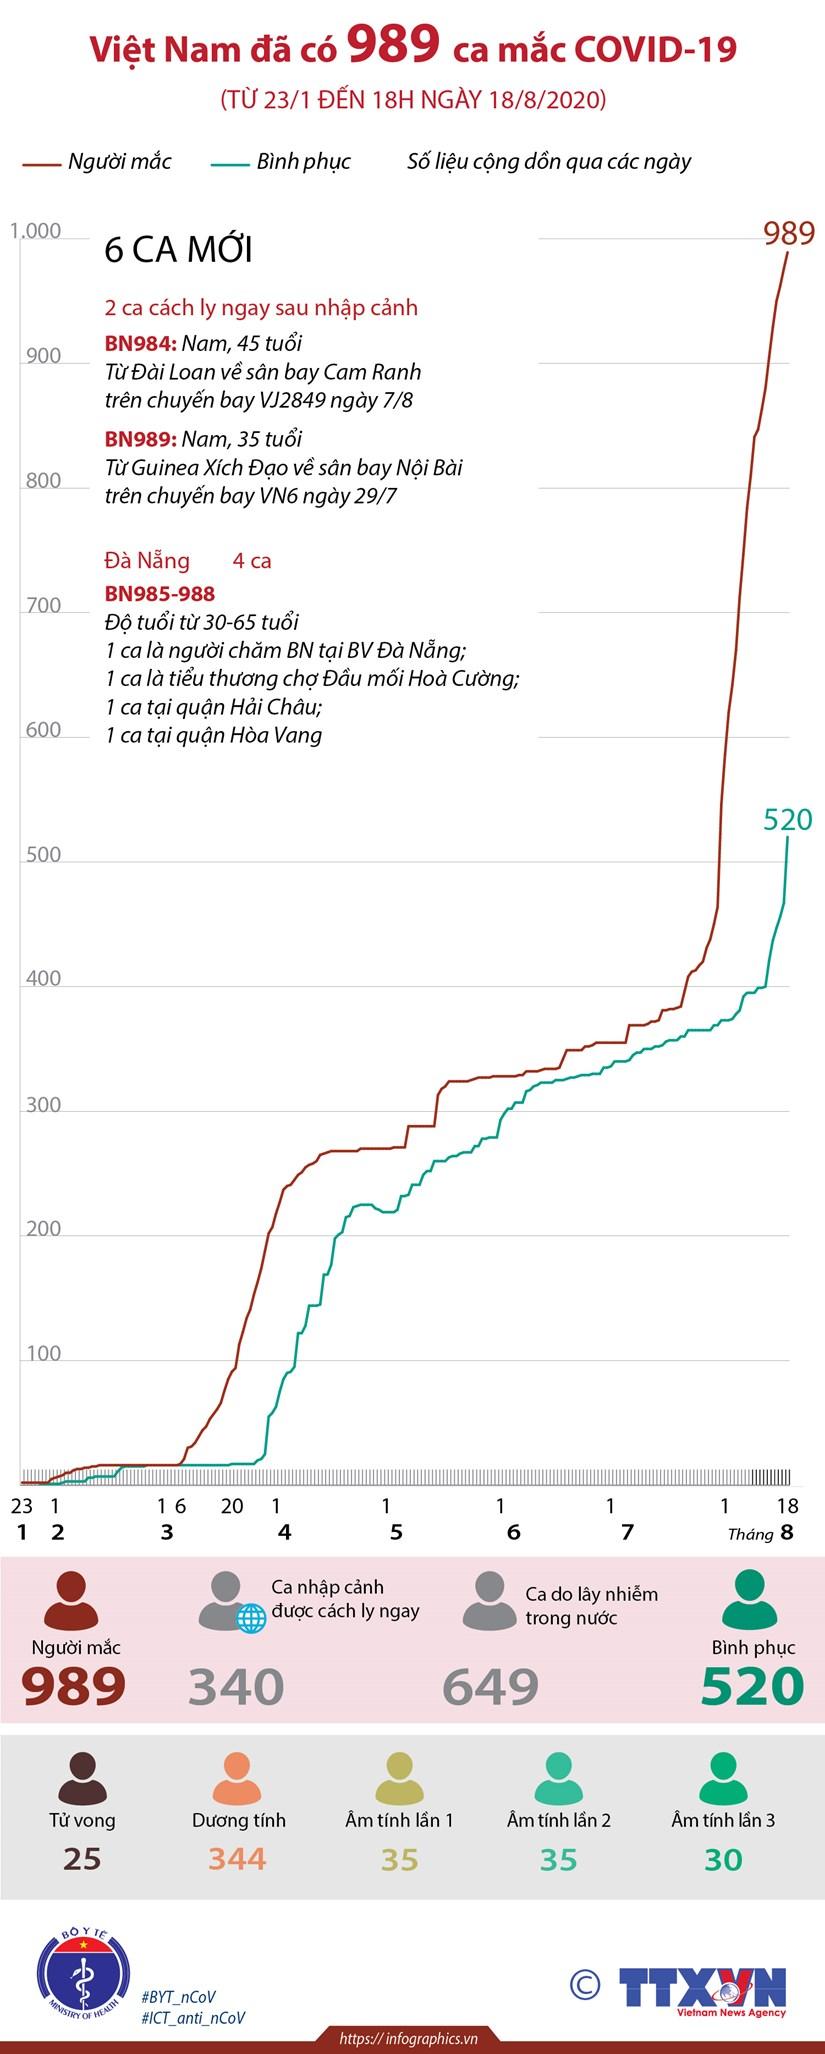 [Infographics] Viet Nam da ghi nhan 989 ca mac COVID-19 hinh anh 1